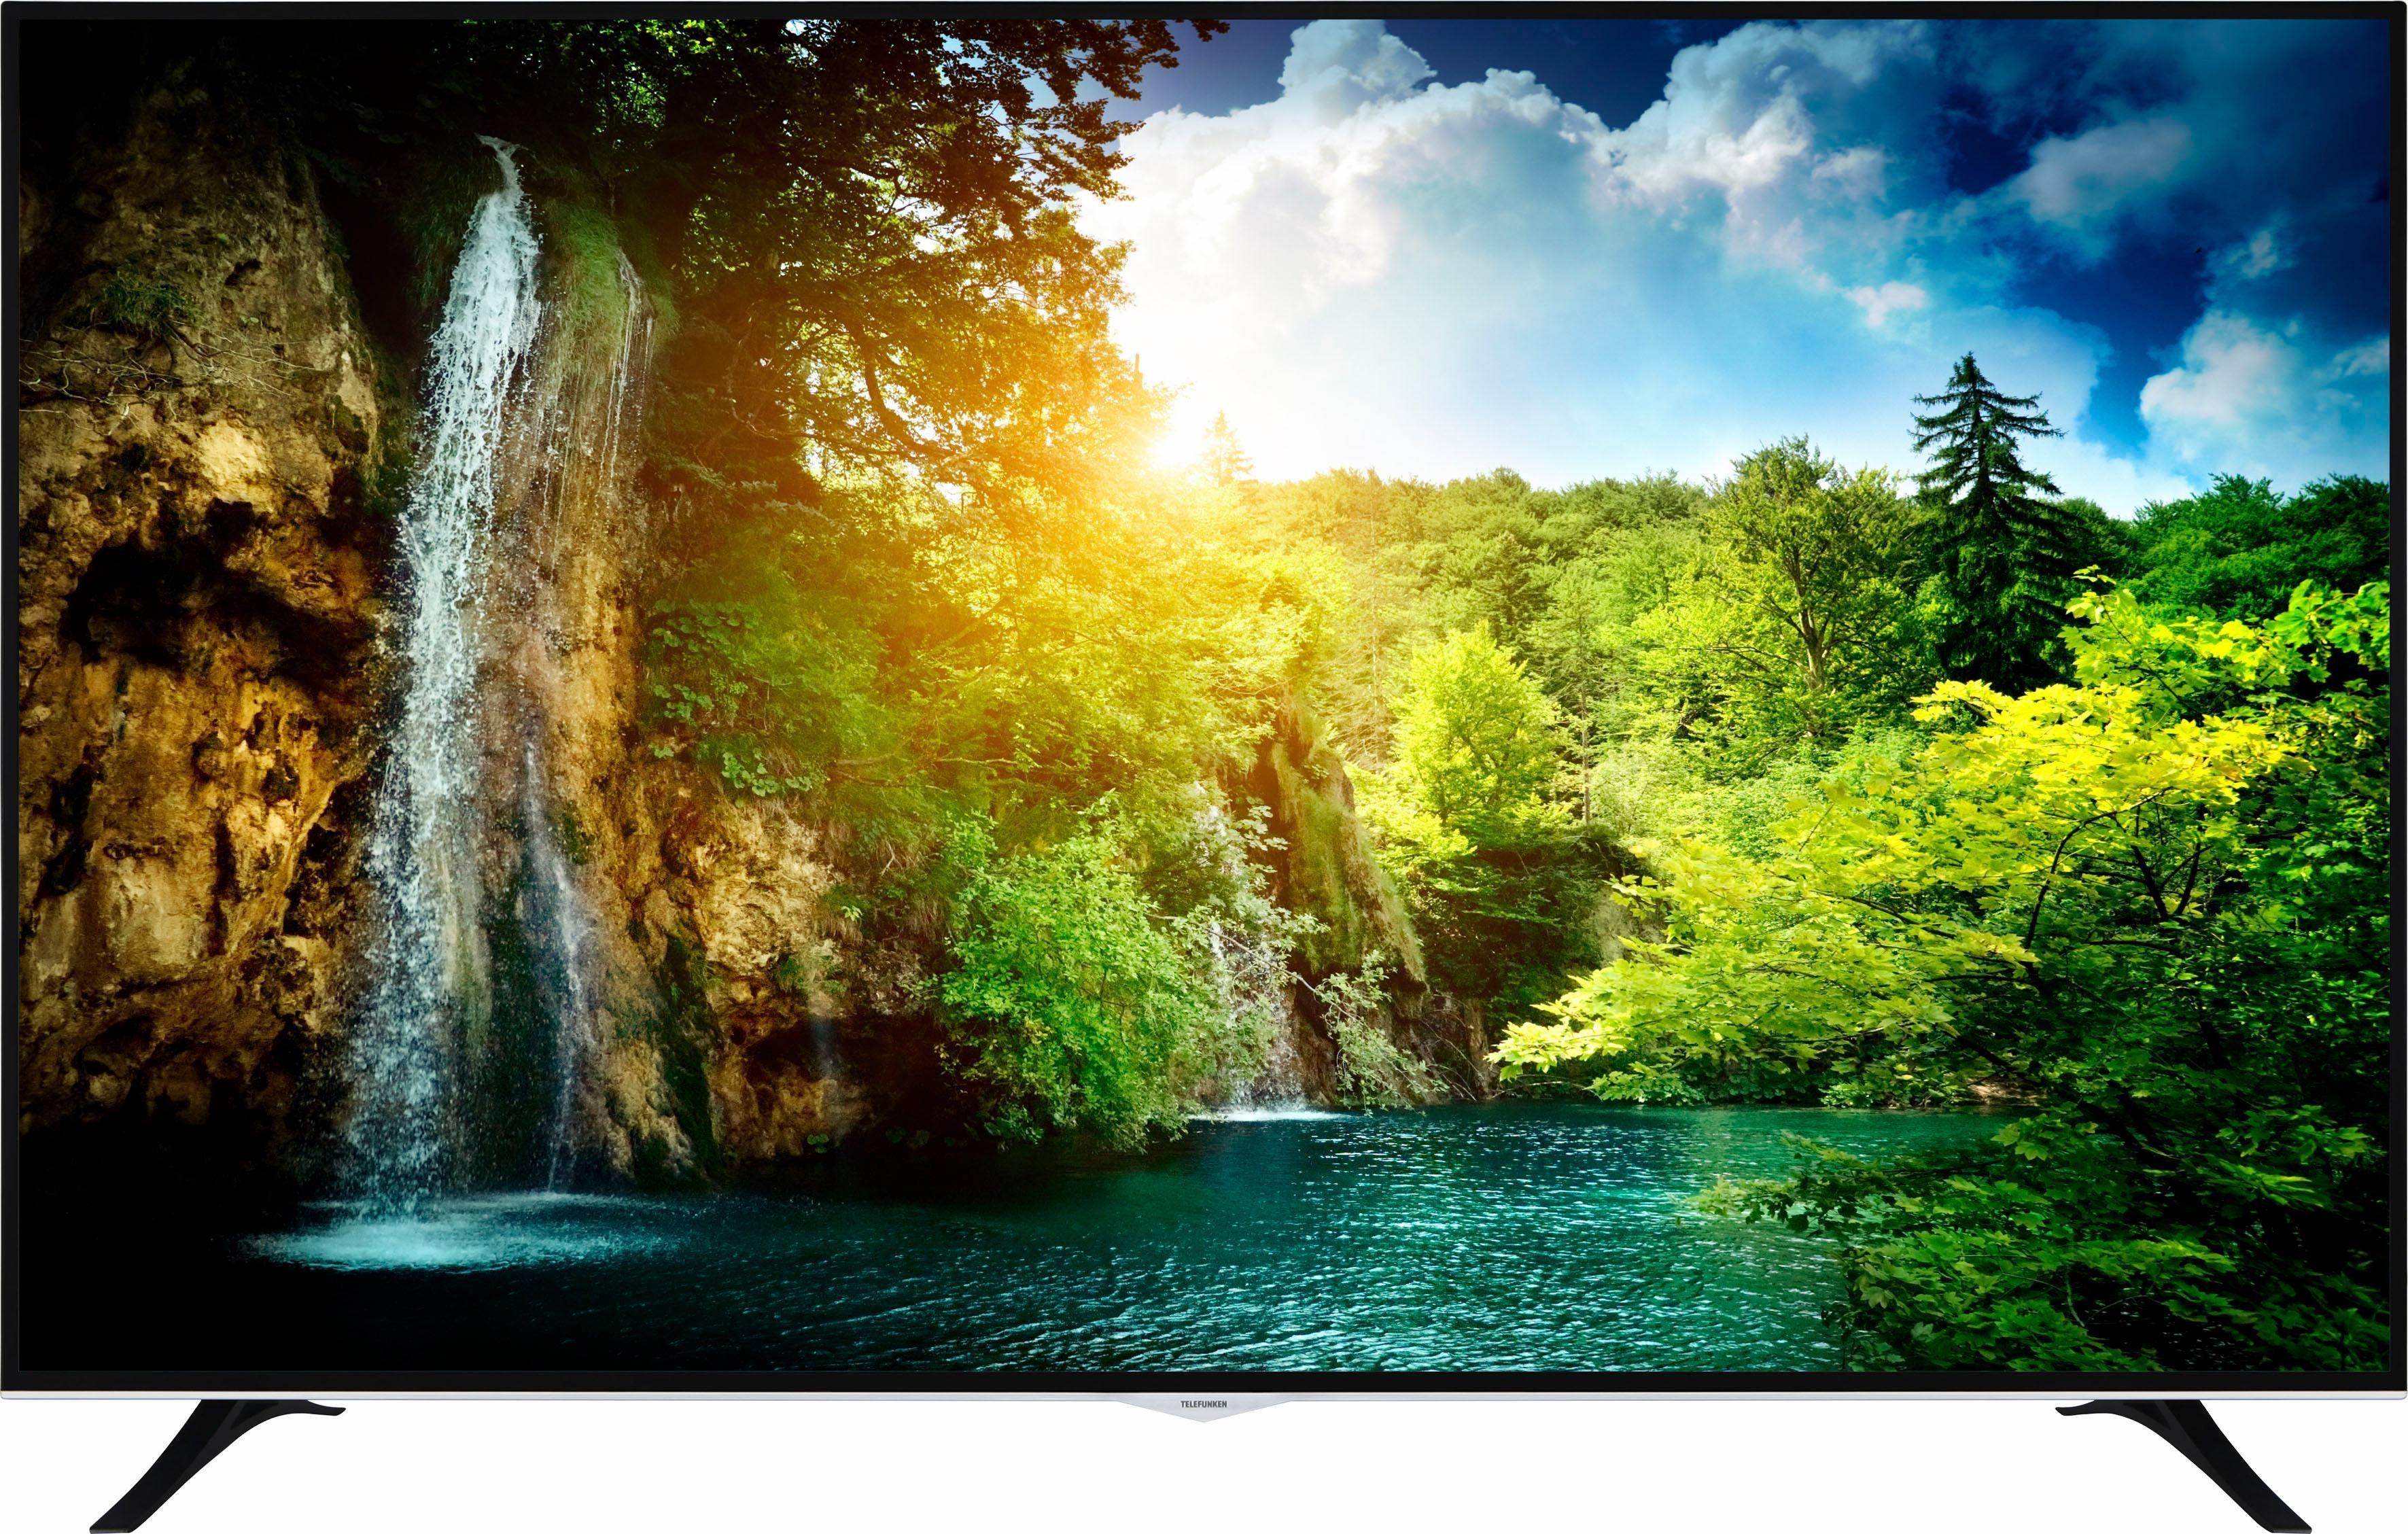 Telefunken D75U400M4CW LED-Fernseher (190 cm/75 Zoll, 4K Ultra HD, Smart-TV)